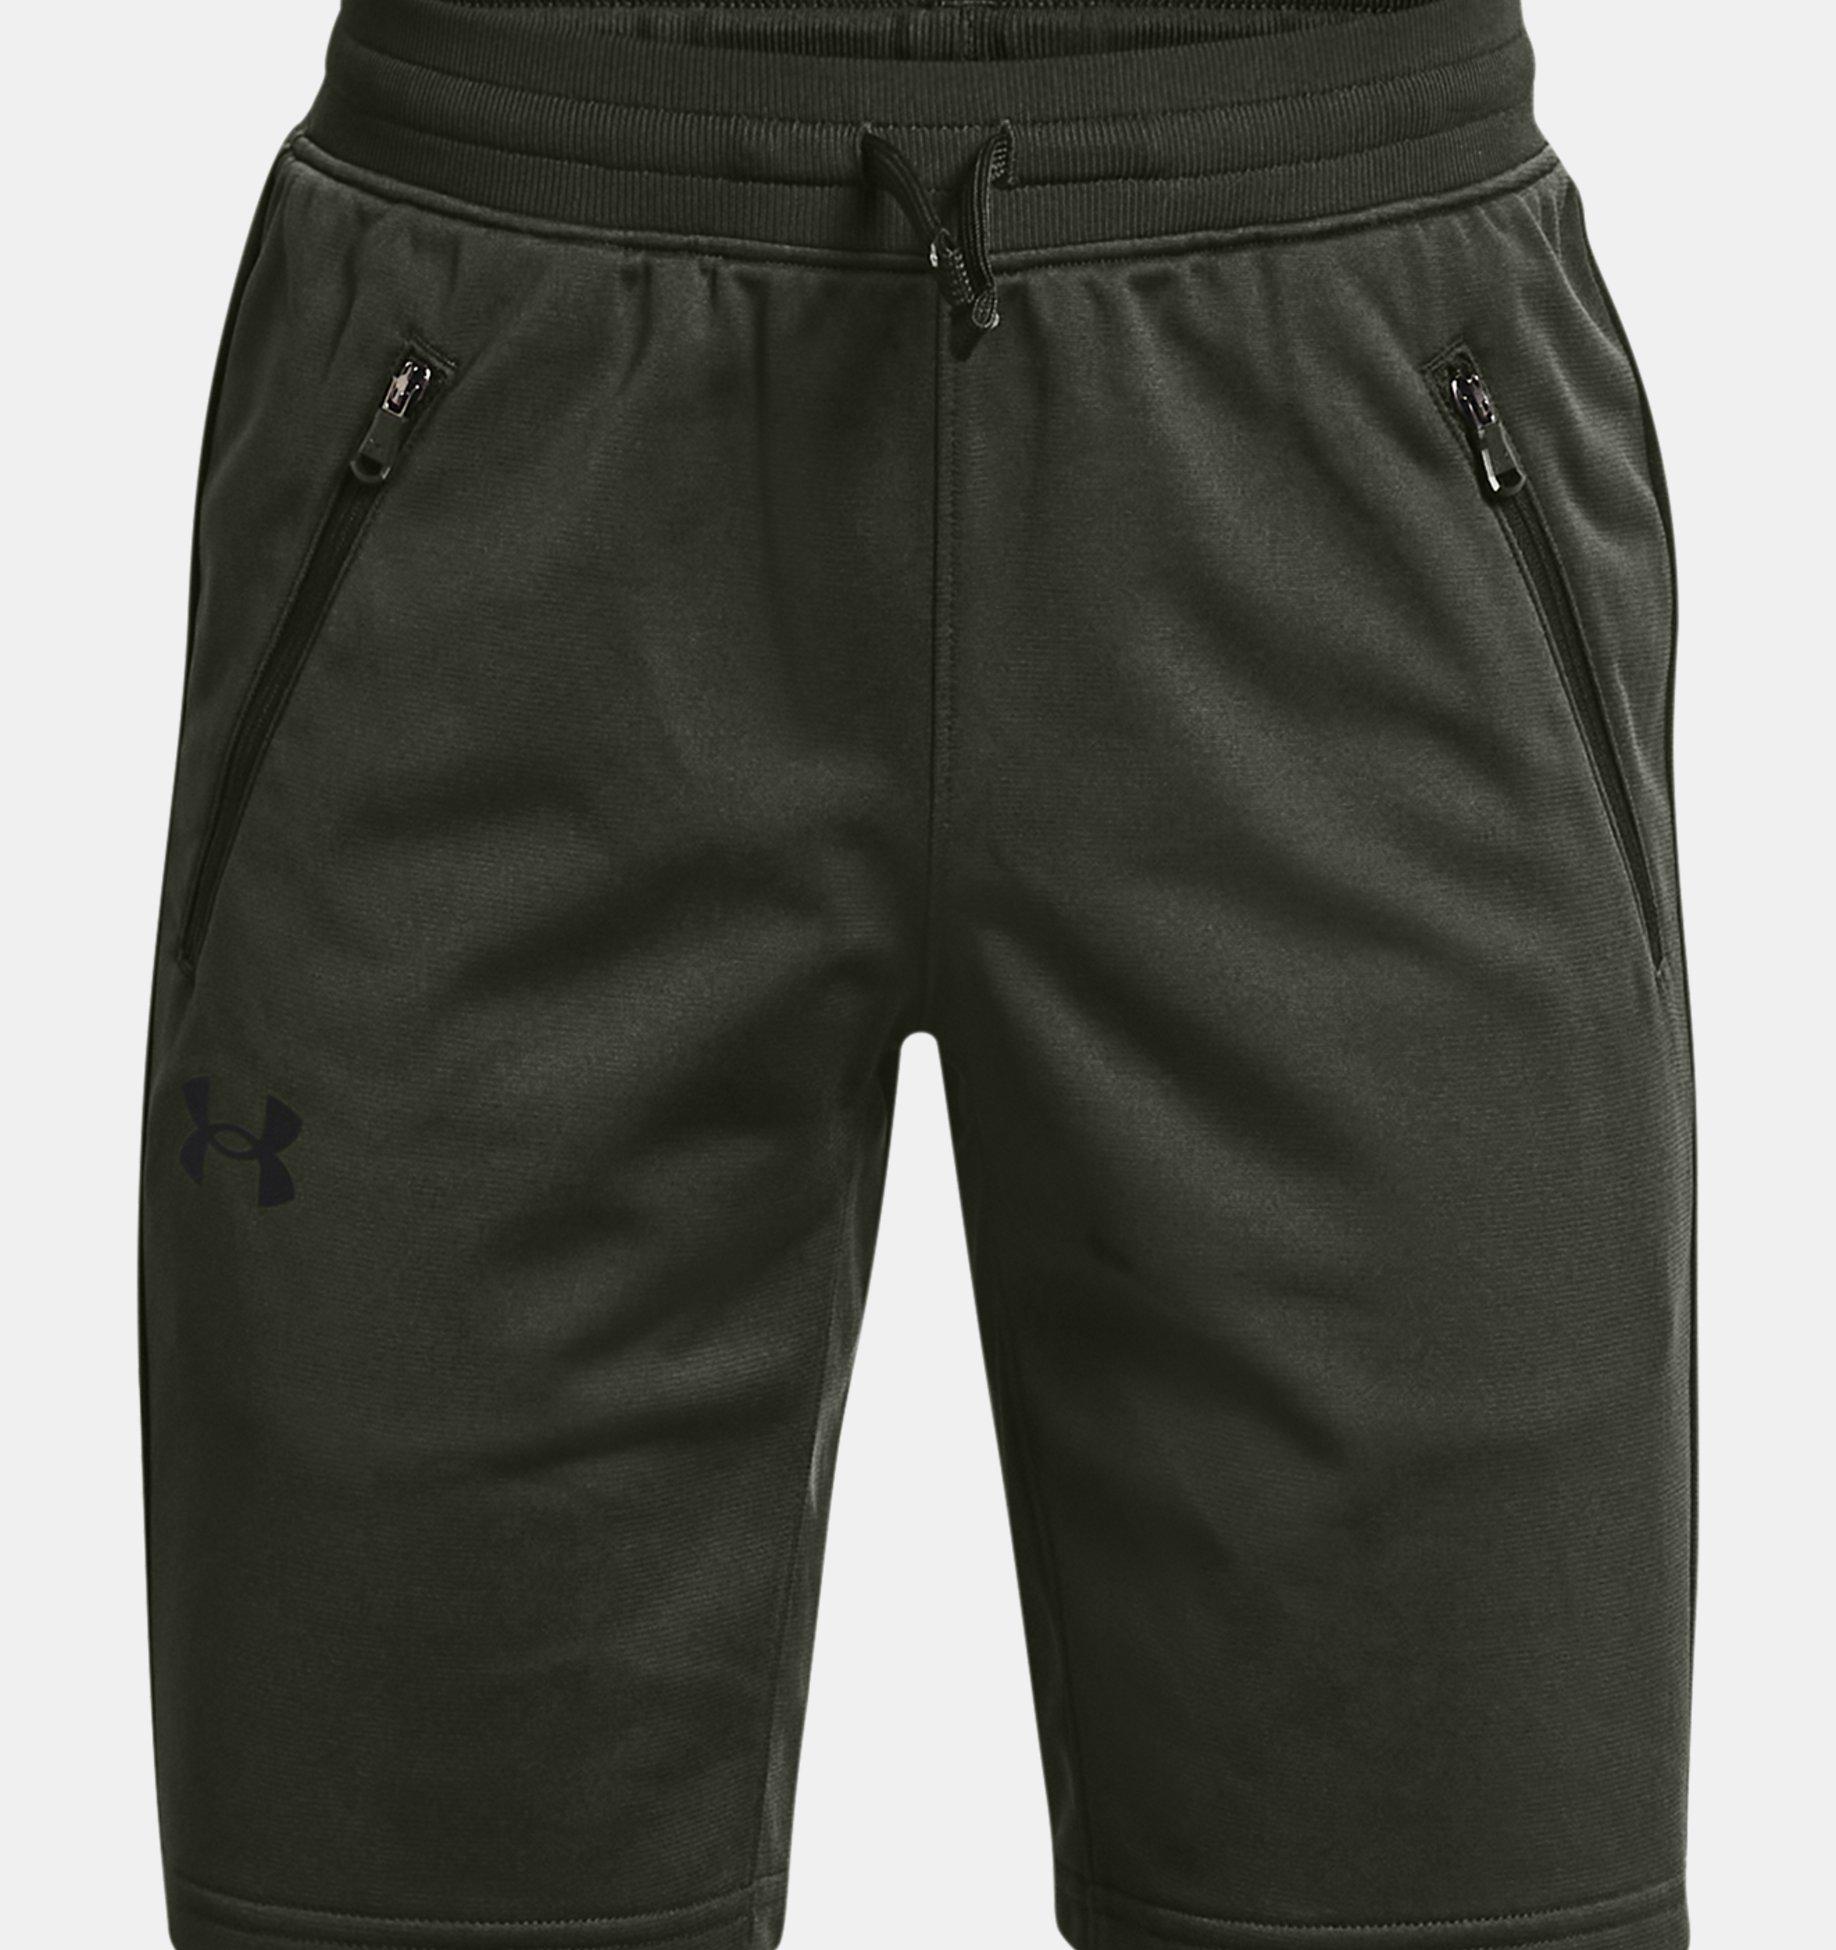 Underarmour Boys UA Pennant Shorts